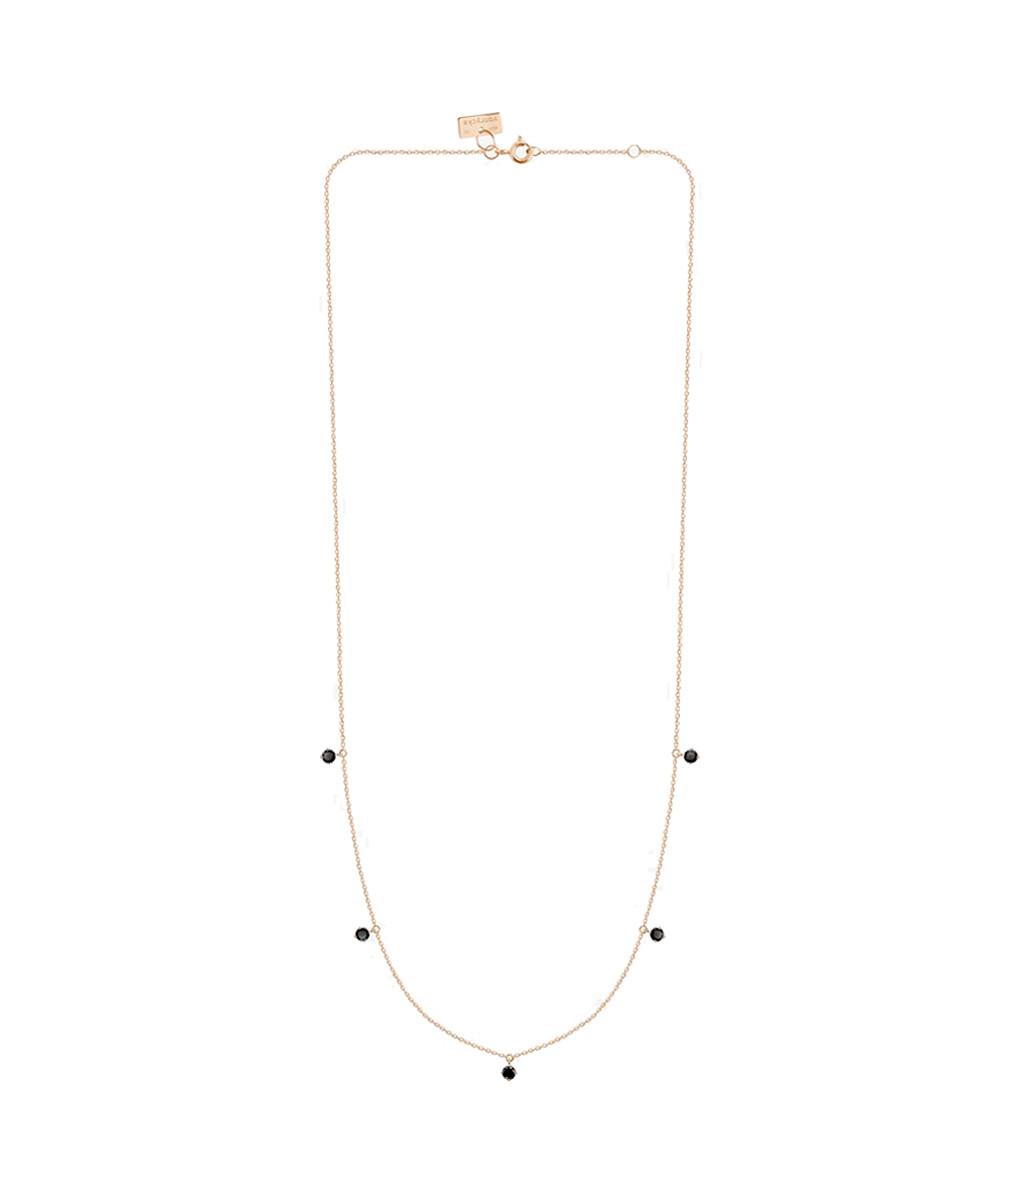 VANRYCKE - Collier Stardust Or Rose 5 Diamants Noir